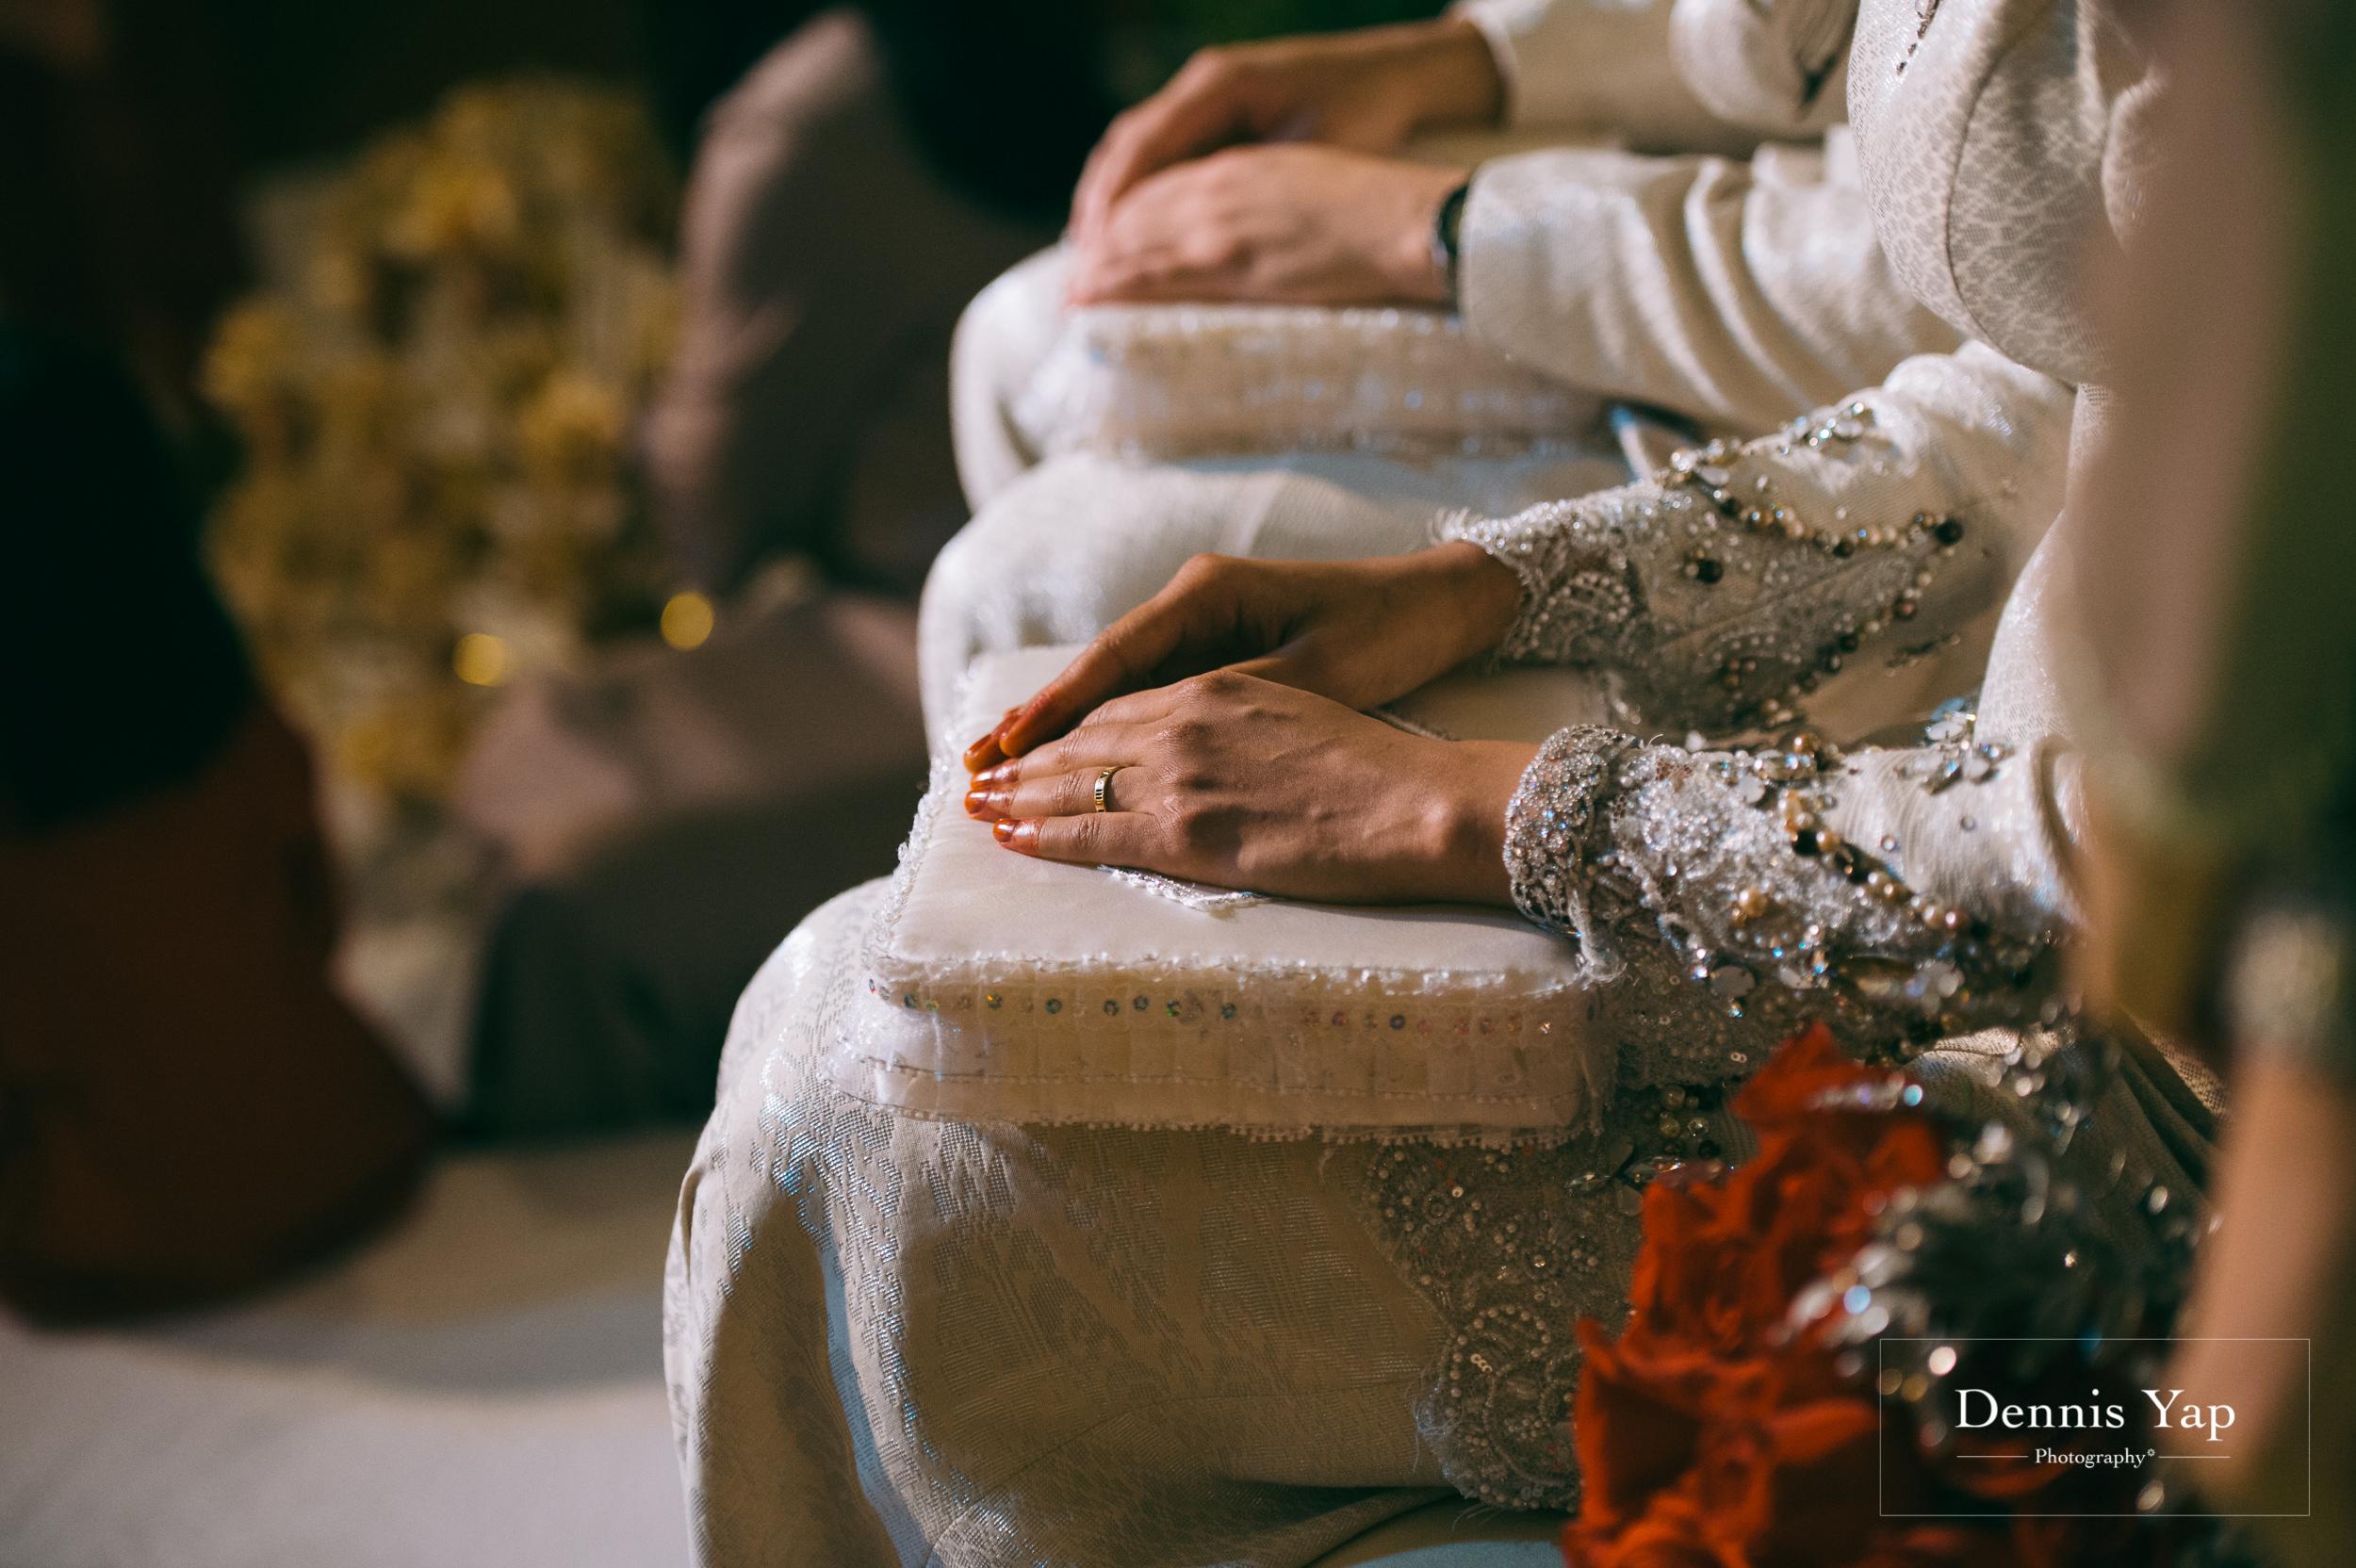 zarif hanalili malay wedding blessing ceremony dennis yap photography-18.jpg